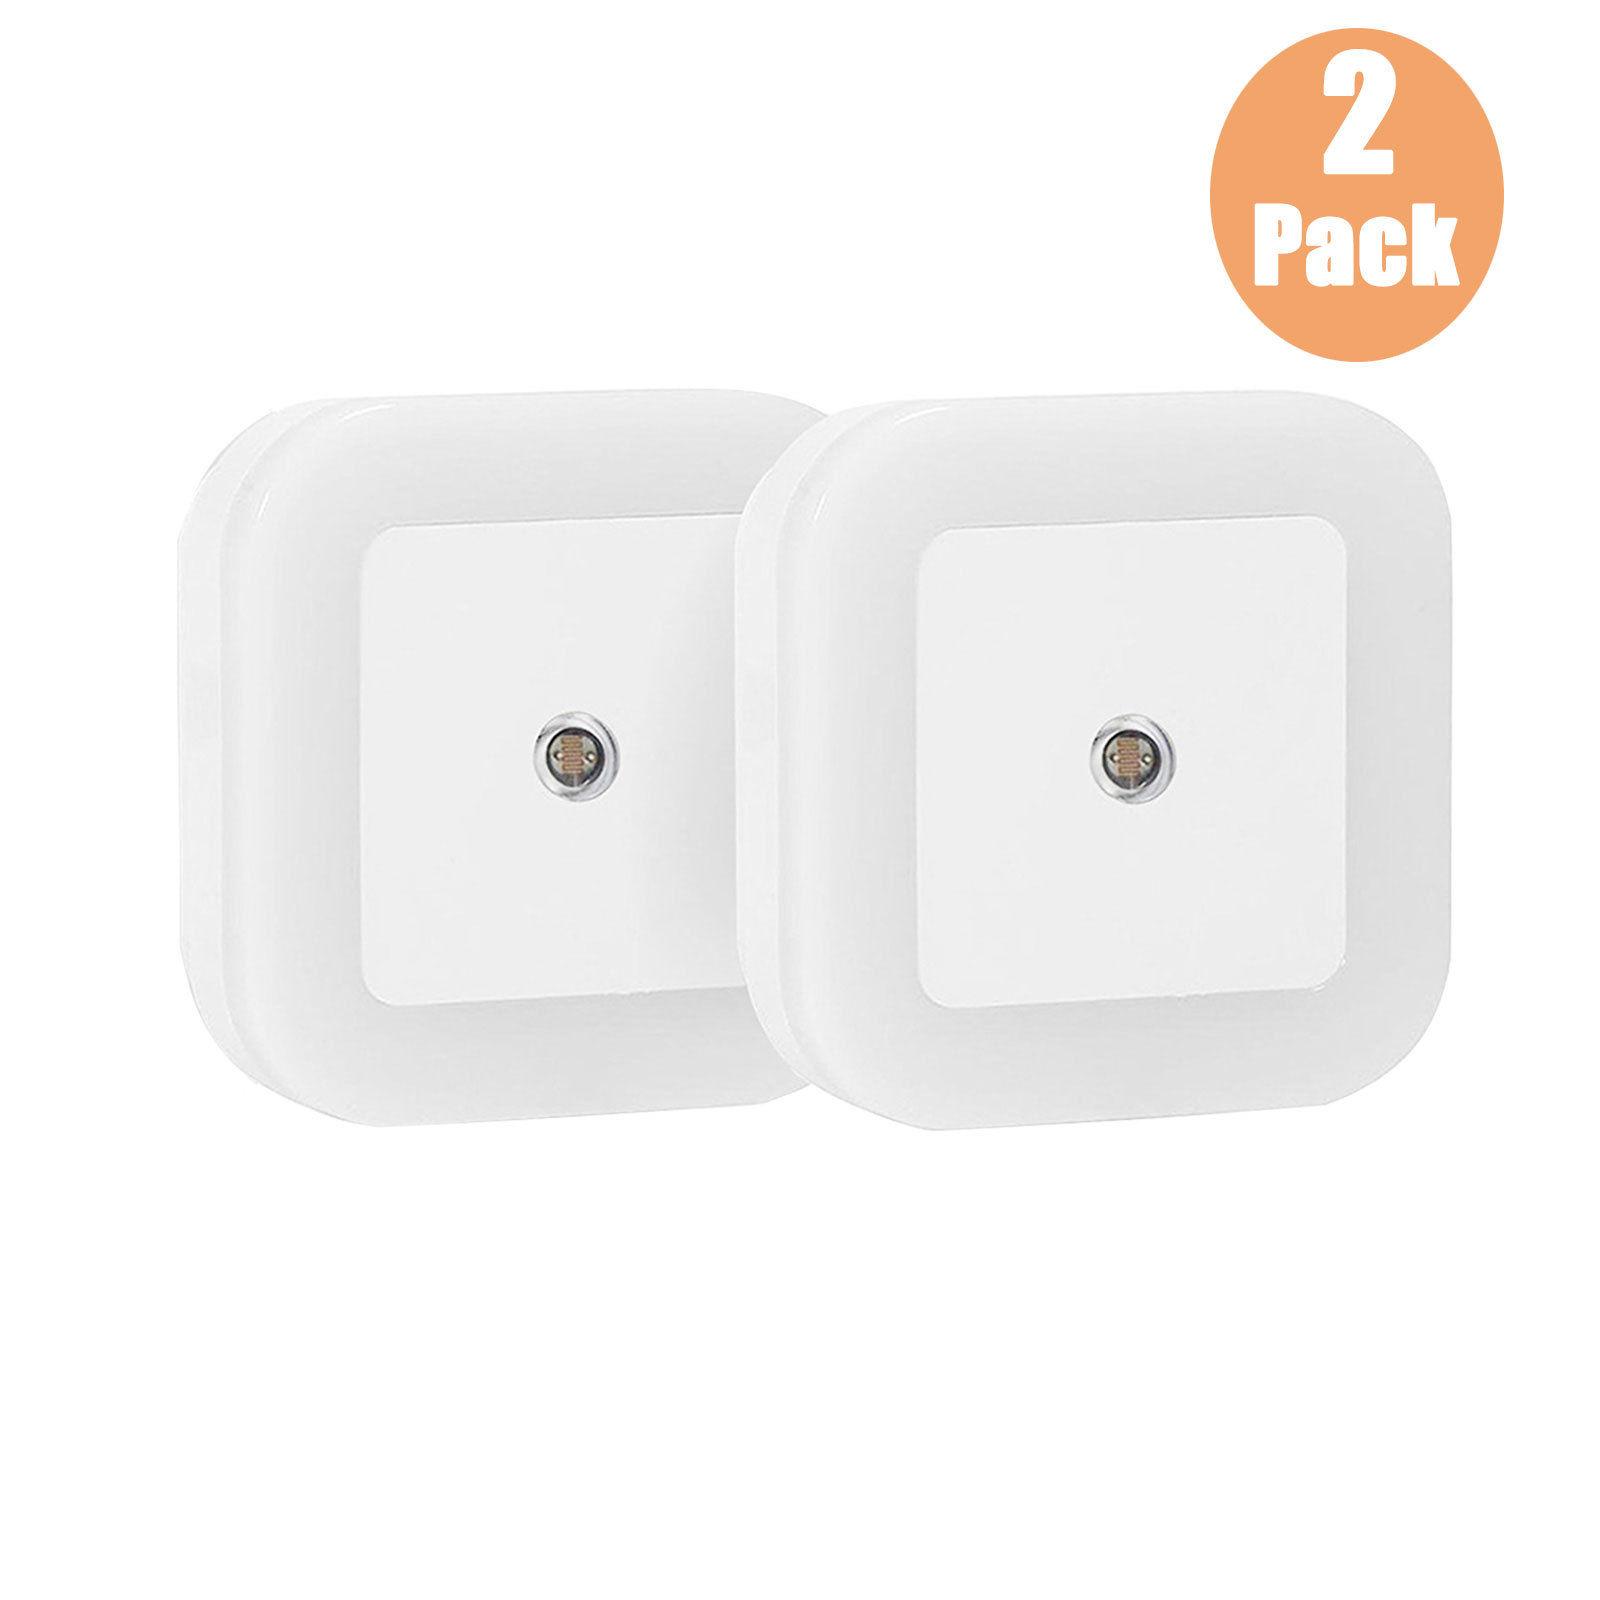 0-5W-Plug-in-Auto-Sensor-Control-LED-Night-Light-Lamp-for-Bedroom-Hallway-Bath thumbnail 12